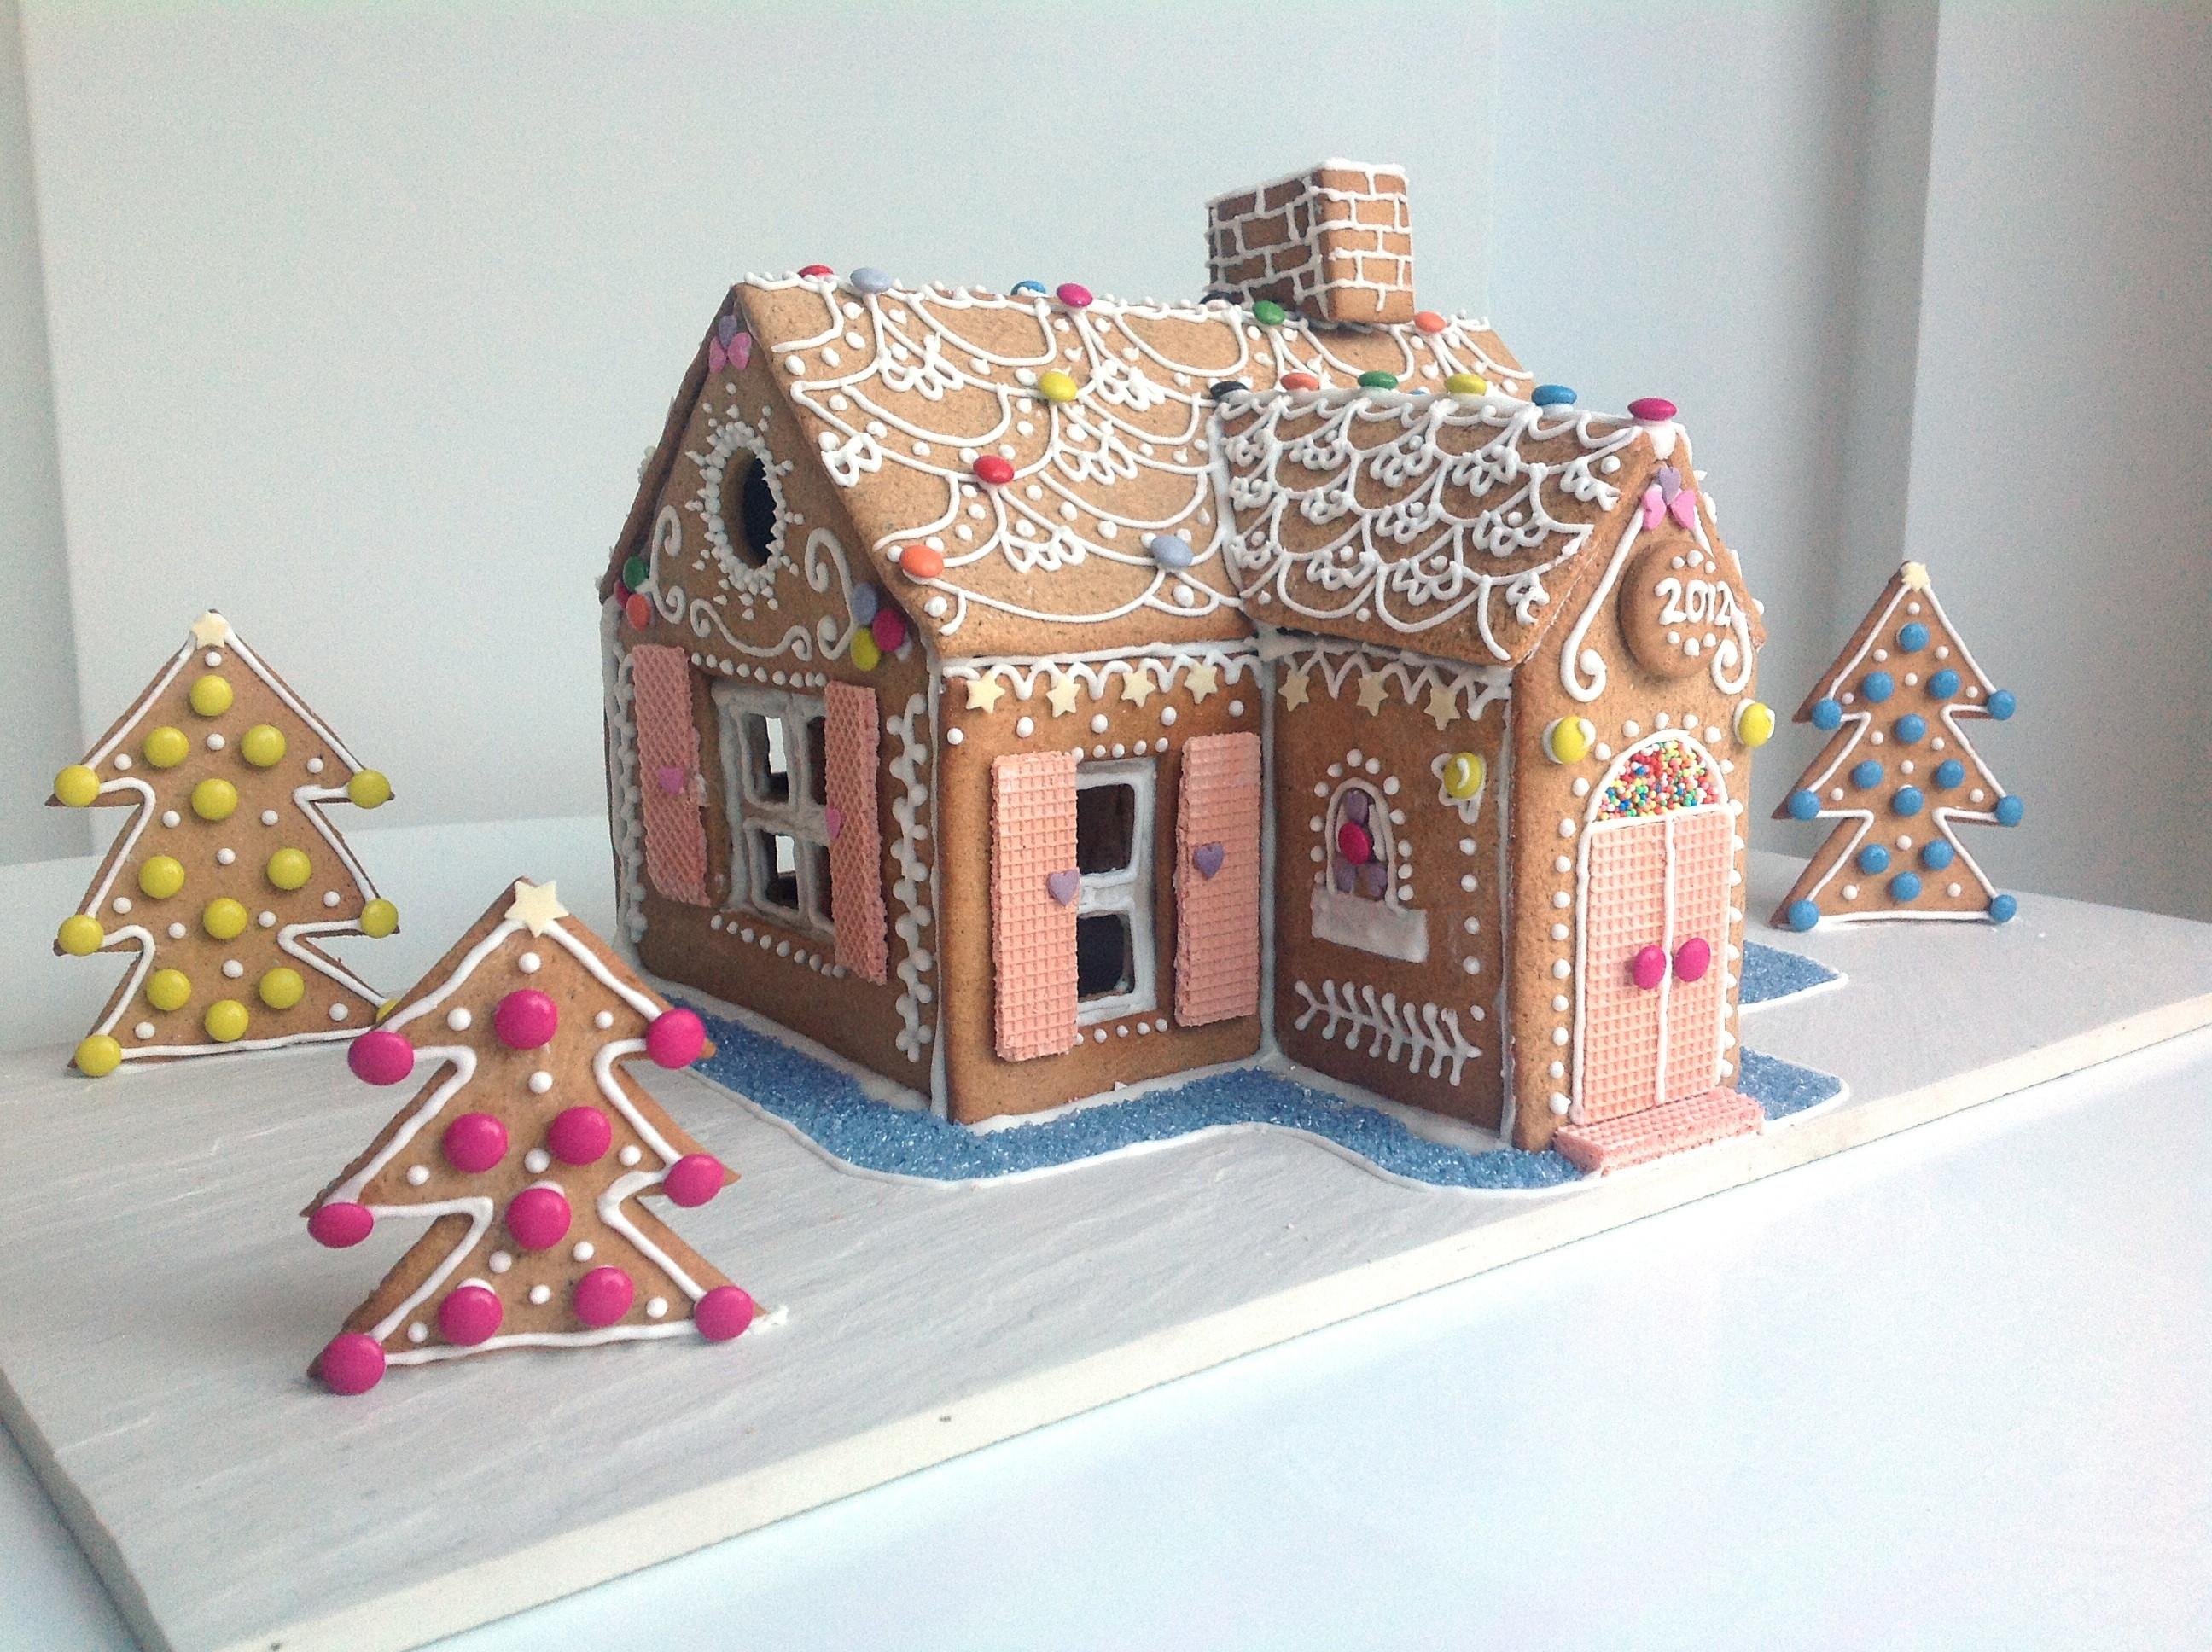 Free photo: Decoration Pieces - Decoration, Decorative ...